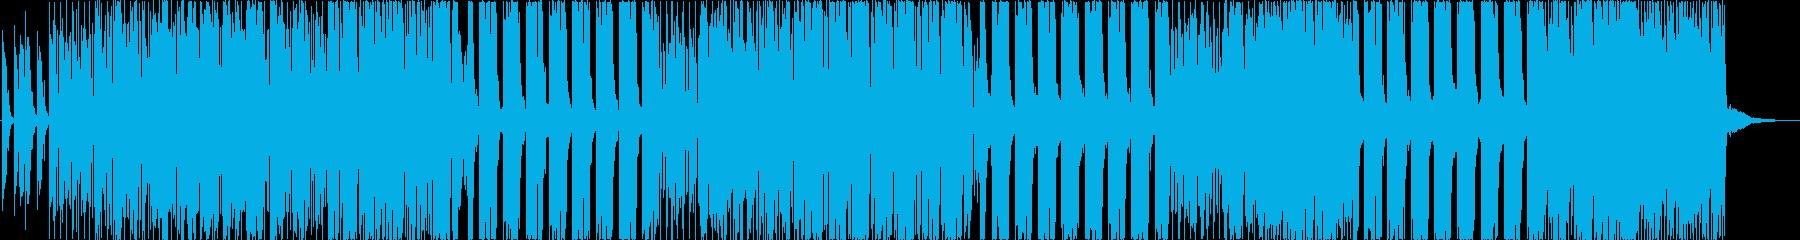 Confused babyの再生済みの波形